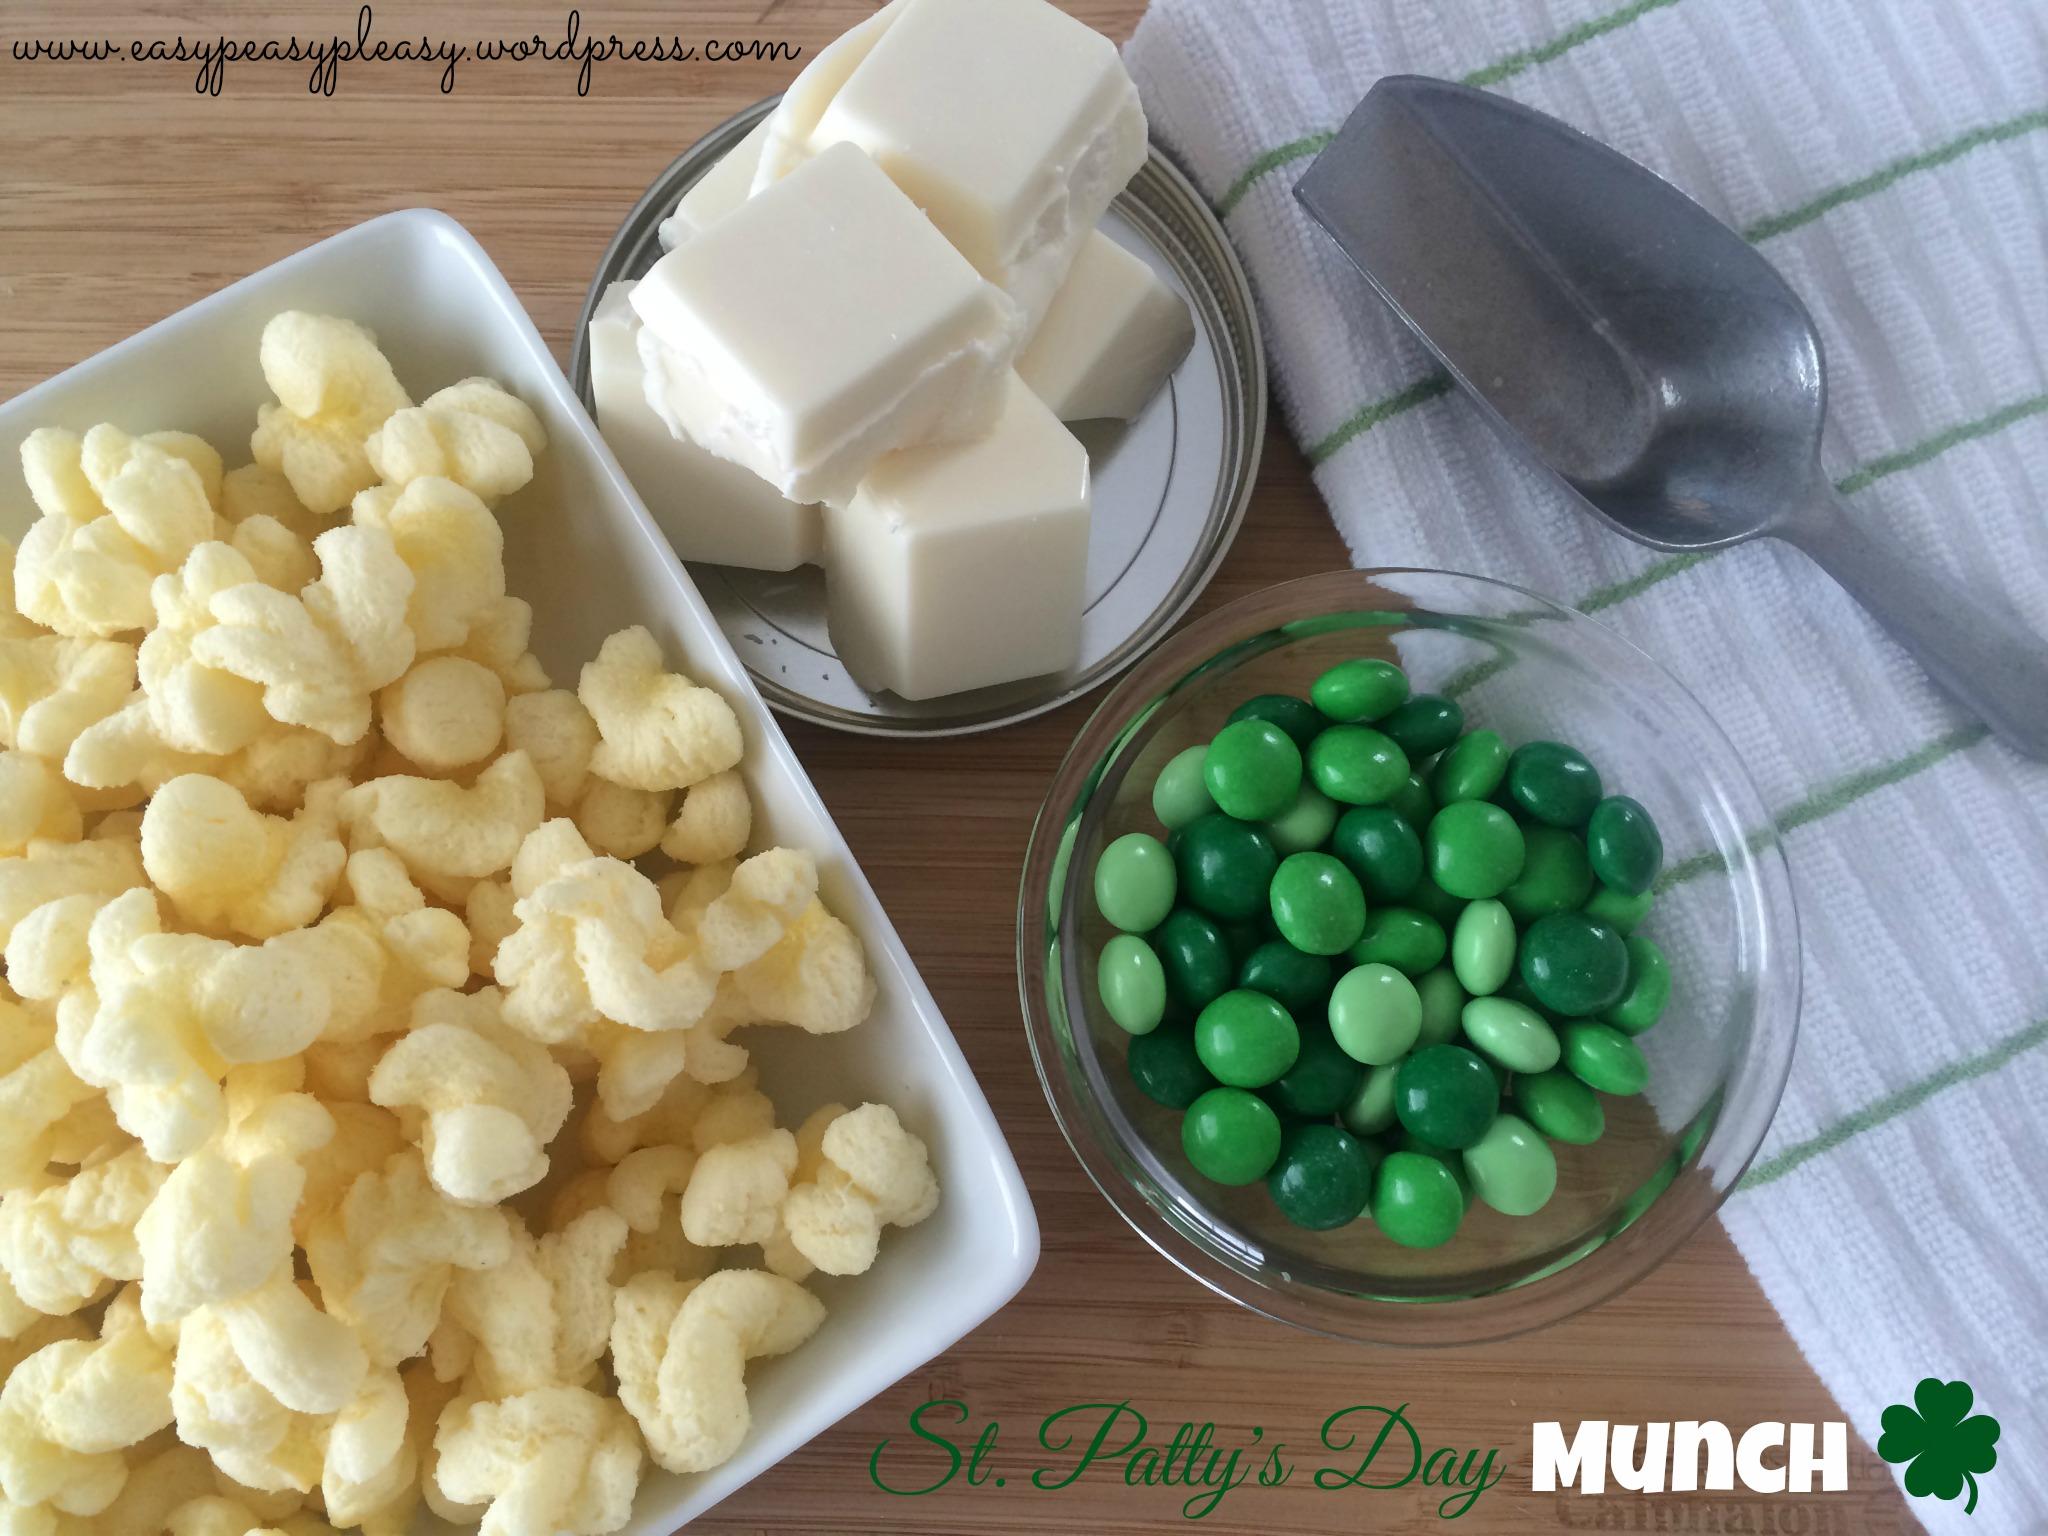 Easy St. Patrick's Day snack Idea at www.easypeasypleasy.wordpress.com